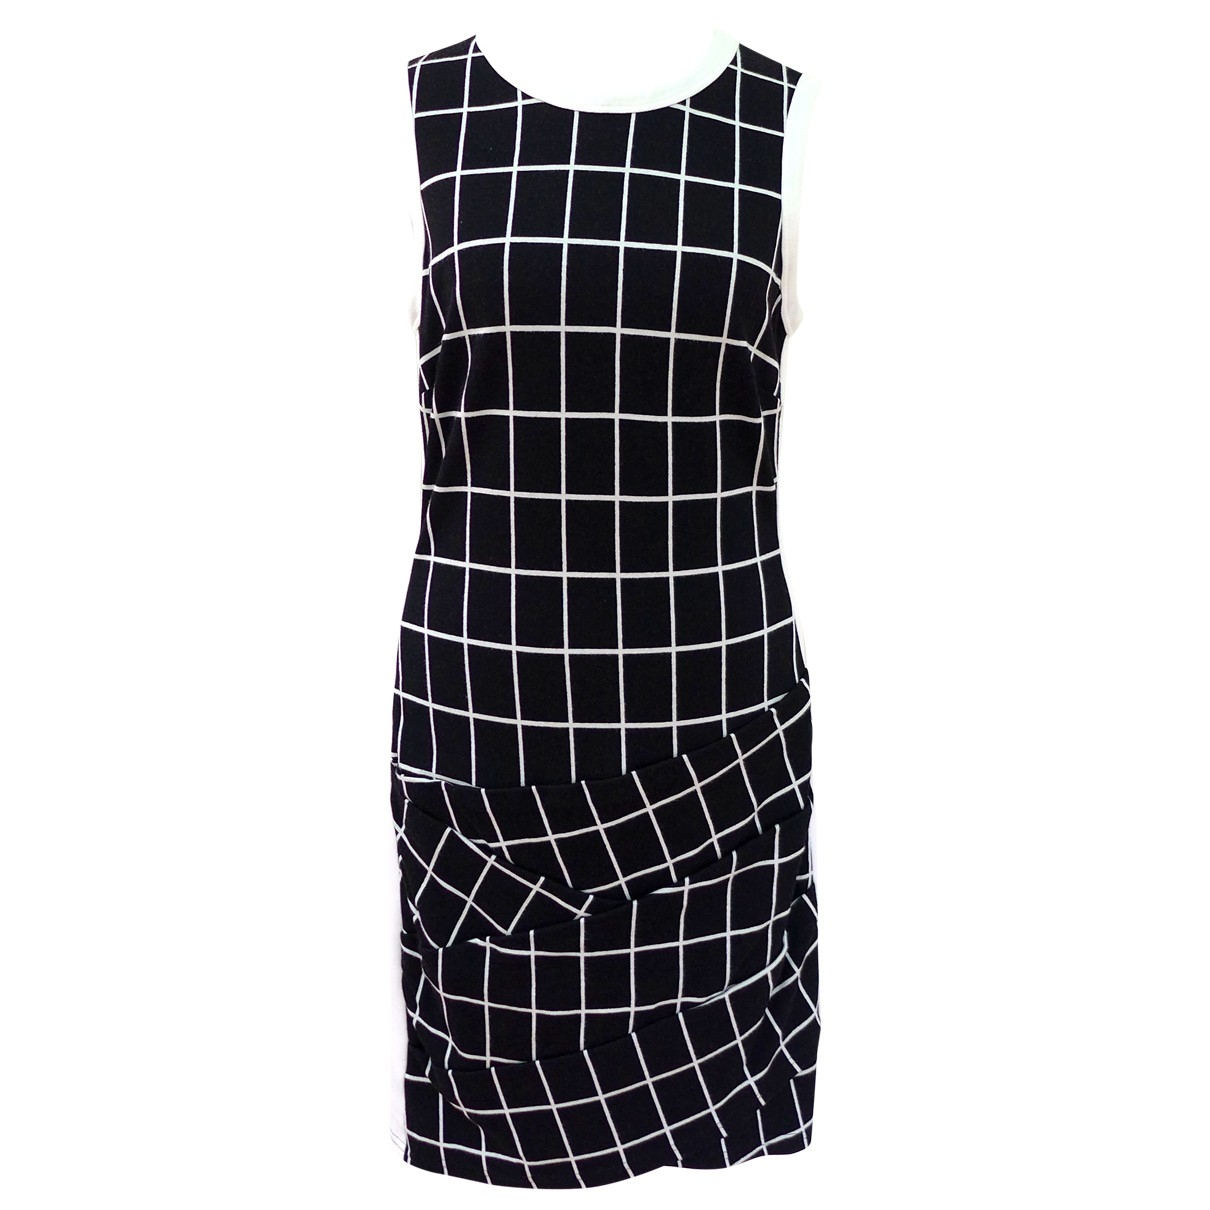 Karen Millen \N Black dress for Women 12 UK